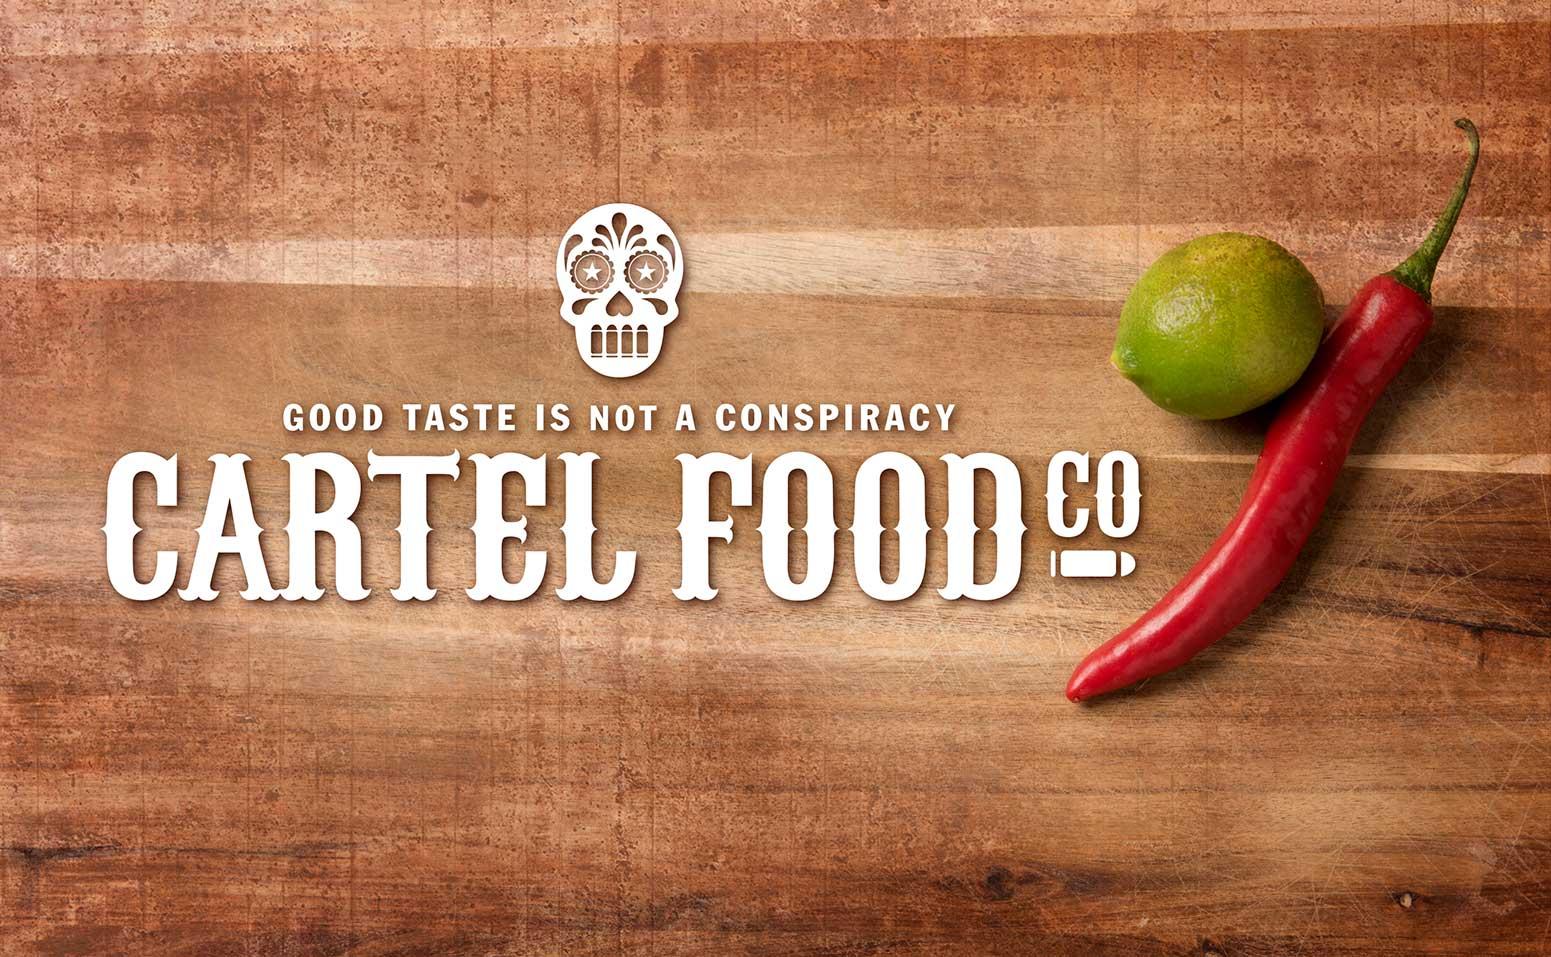 cartel-food-header